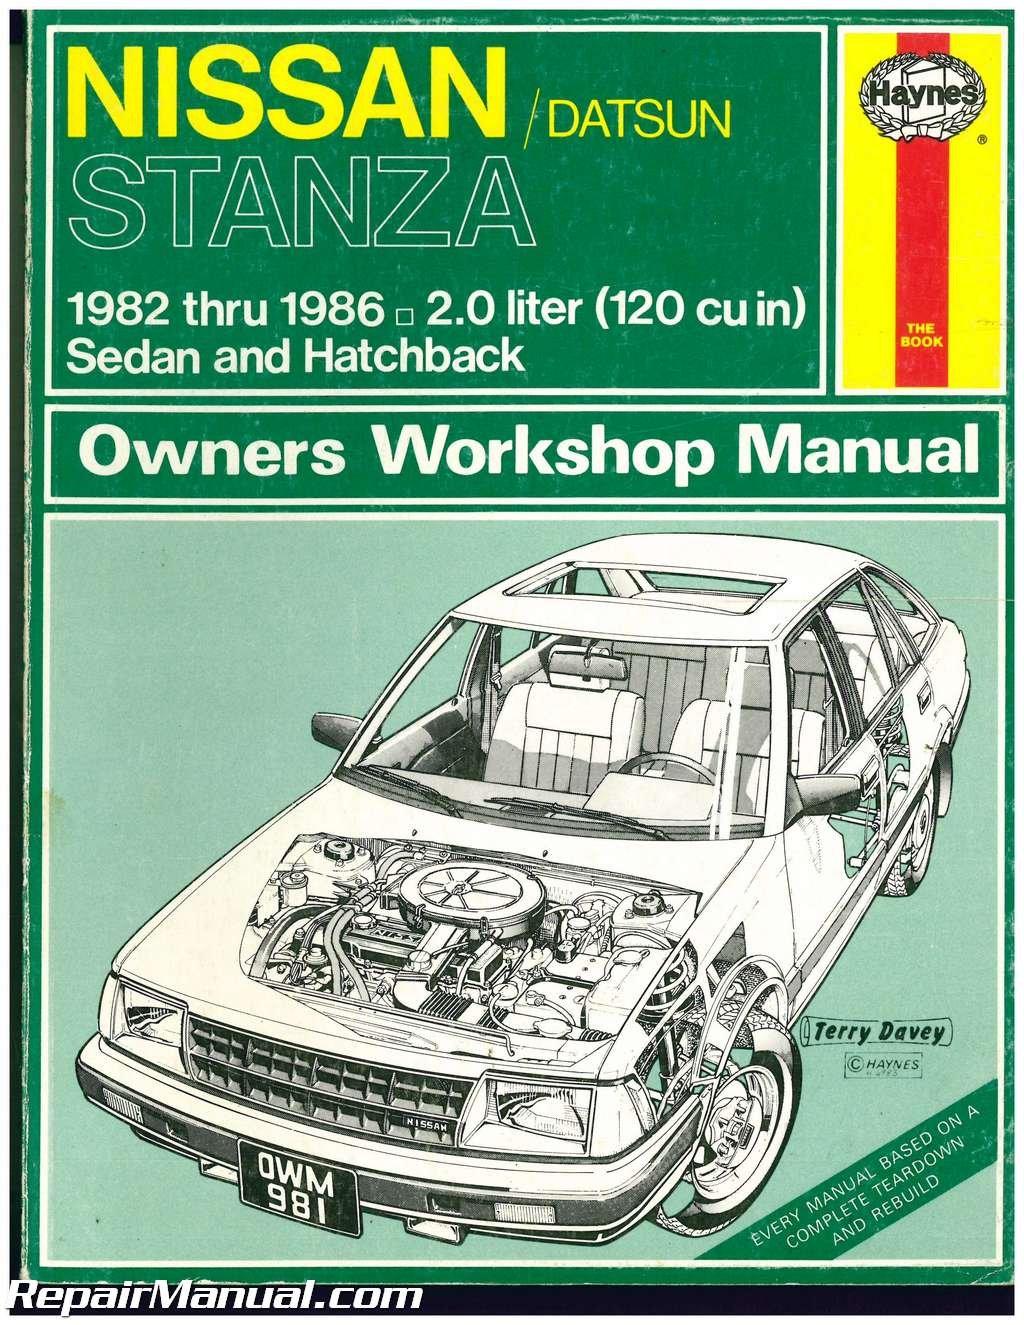 uh981 used haynes datsun nissan stanza 1982 1986 auto repair manual rh amazon com Auto Repair Manuals Online Online Repair Manuals